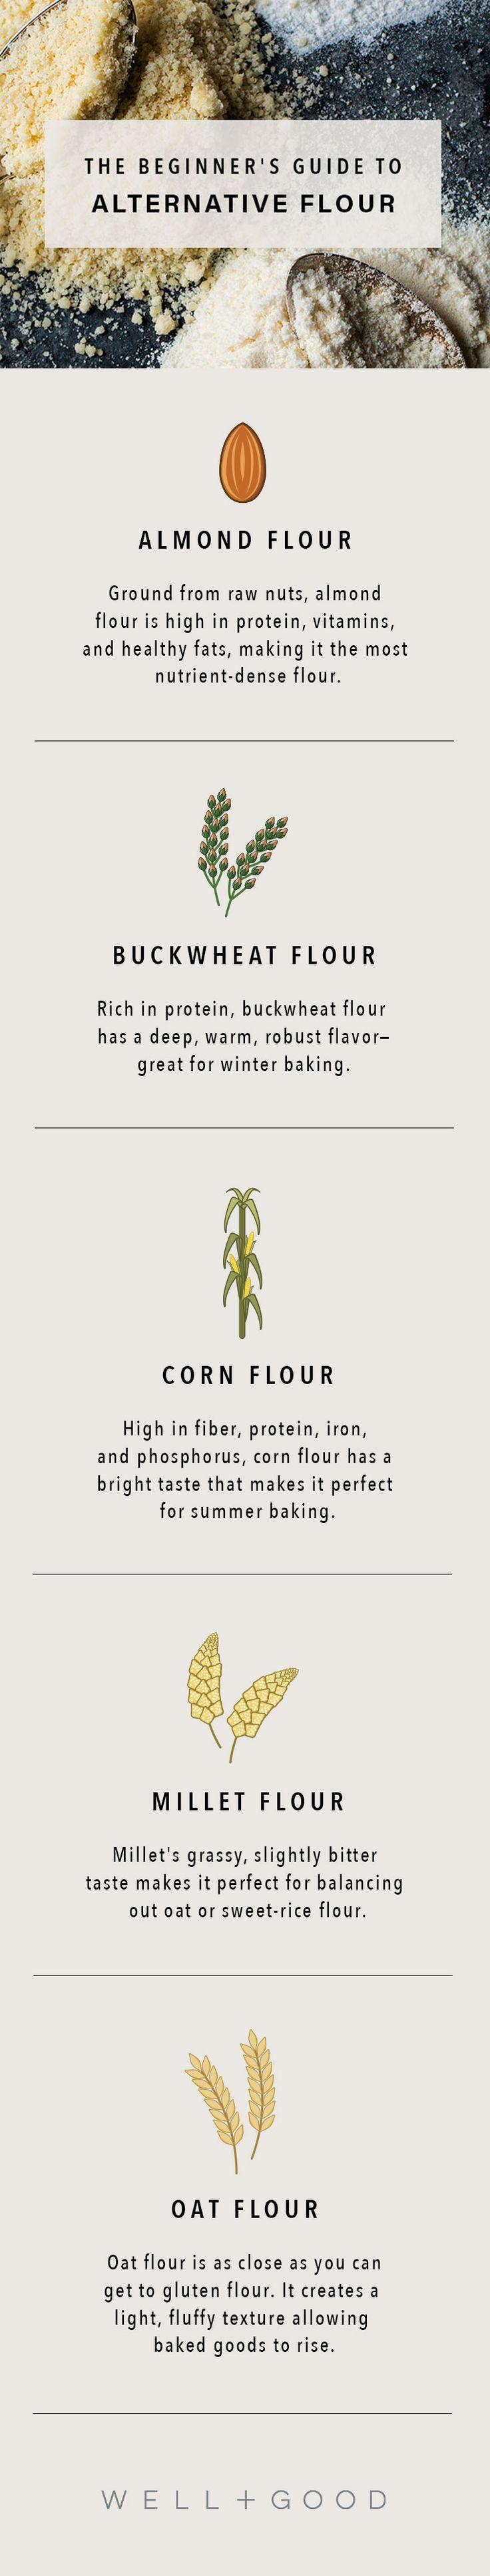 Gluten-free guide to alternative flours.